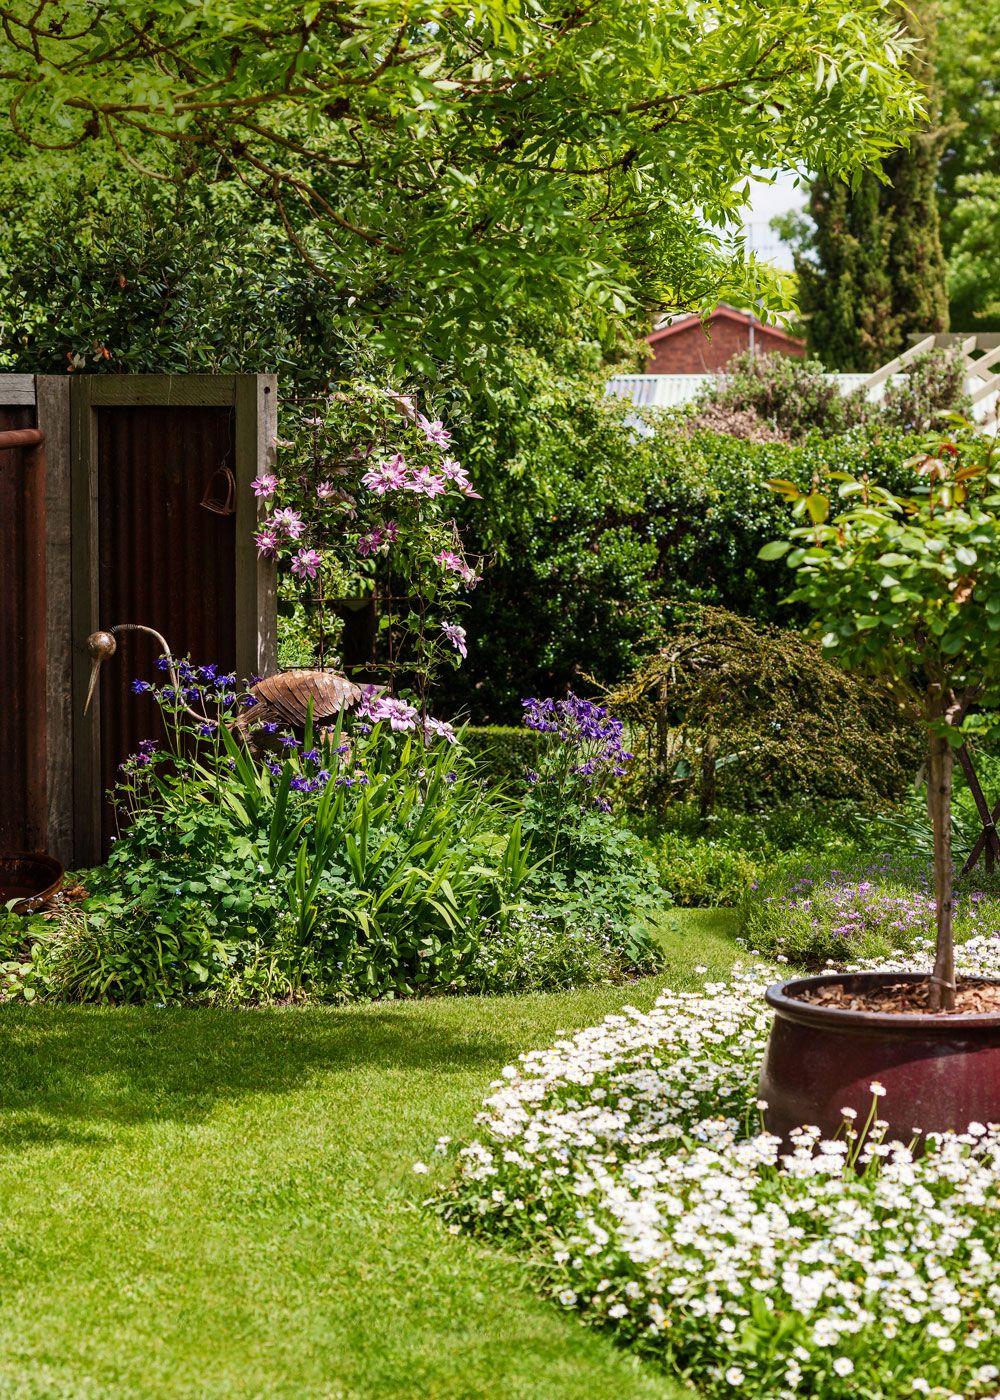 Create A Country Style Garden Garden Styles Front Yard Design Yard Design